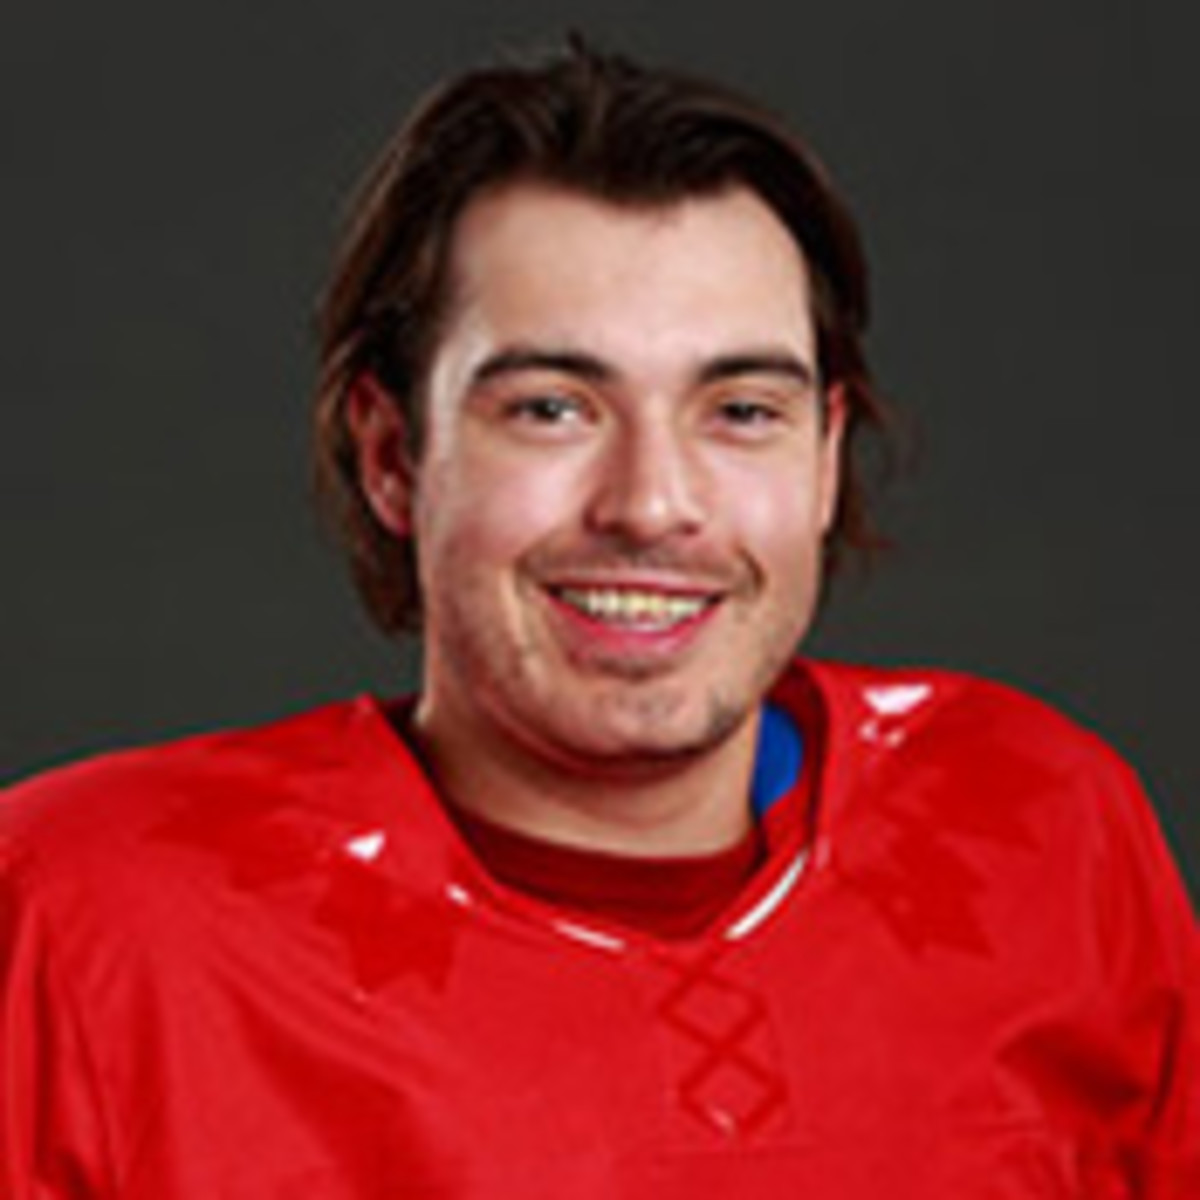 drew doughty 2014 canada men's hockey